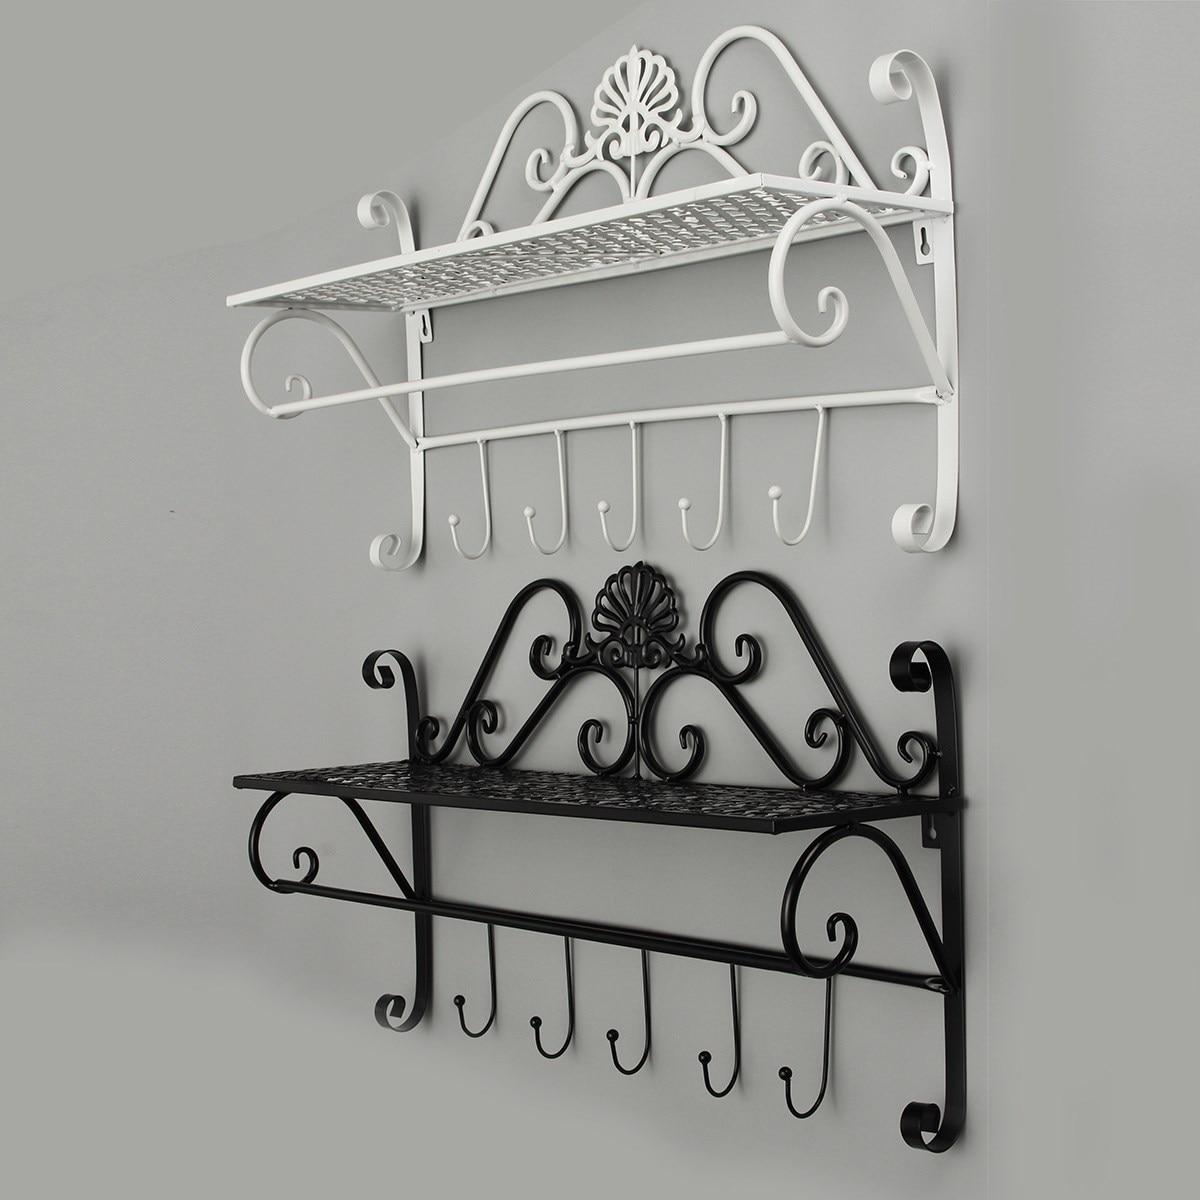 Bathroom storage rack dact bathroom storage rack wrought iron wall towel rack shelf single amipublicfo Choice Image